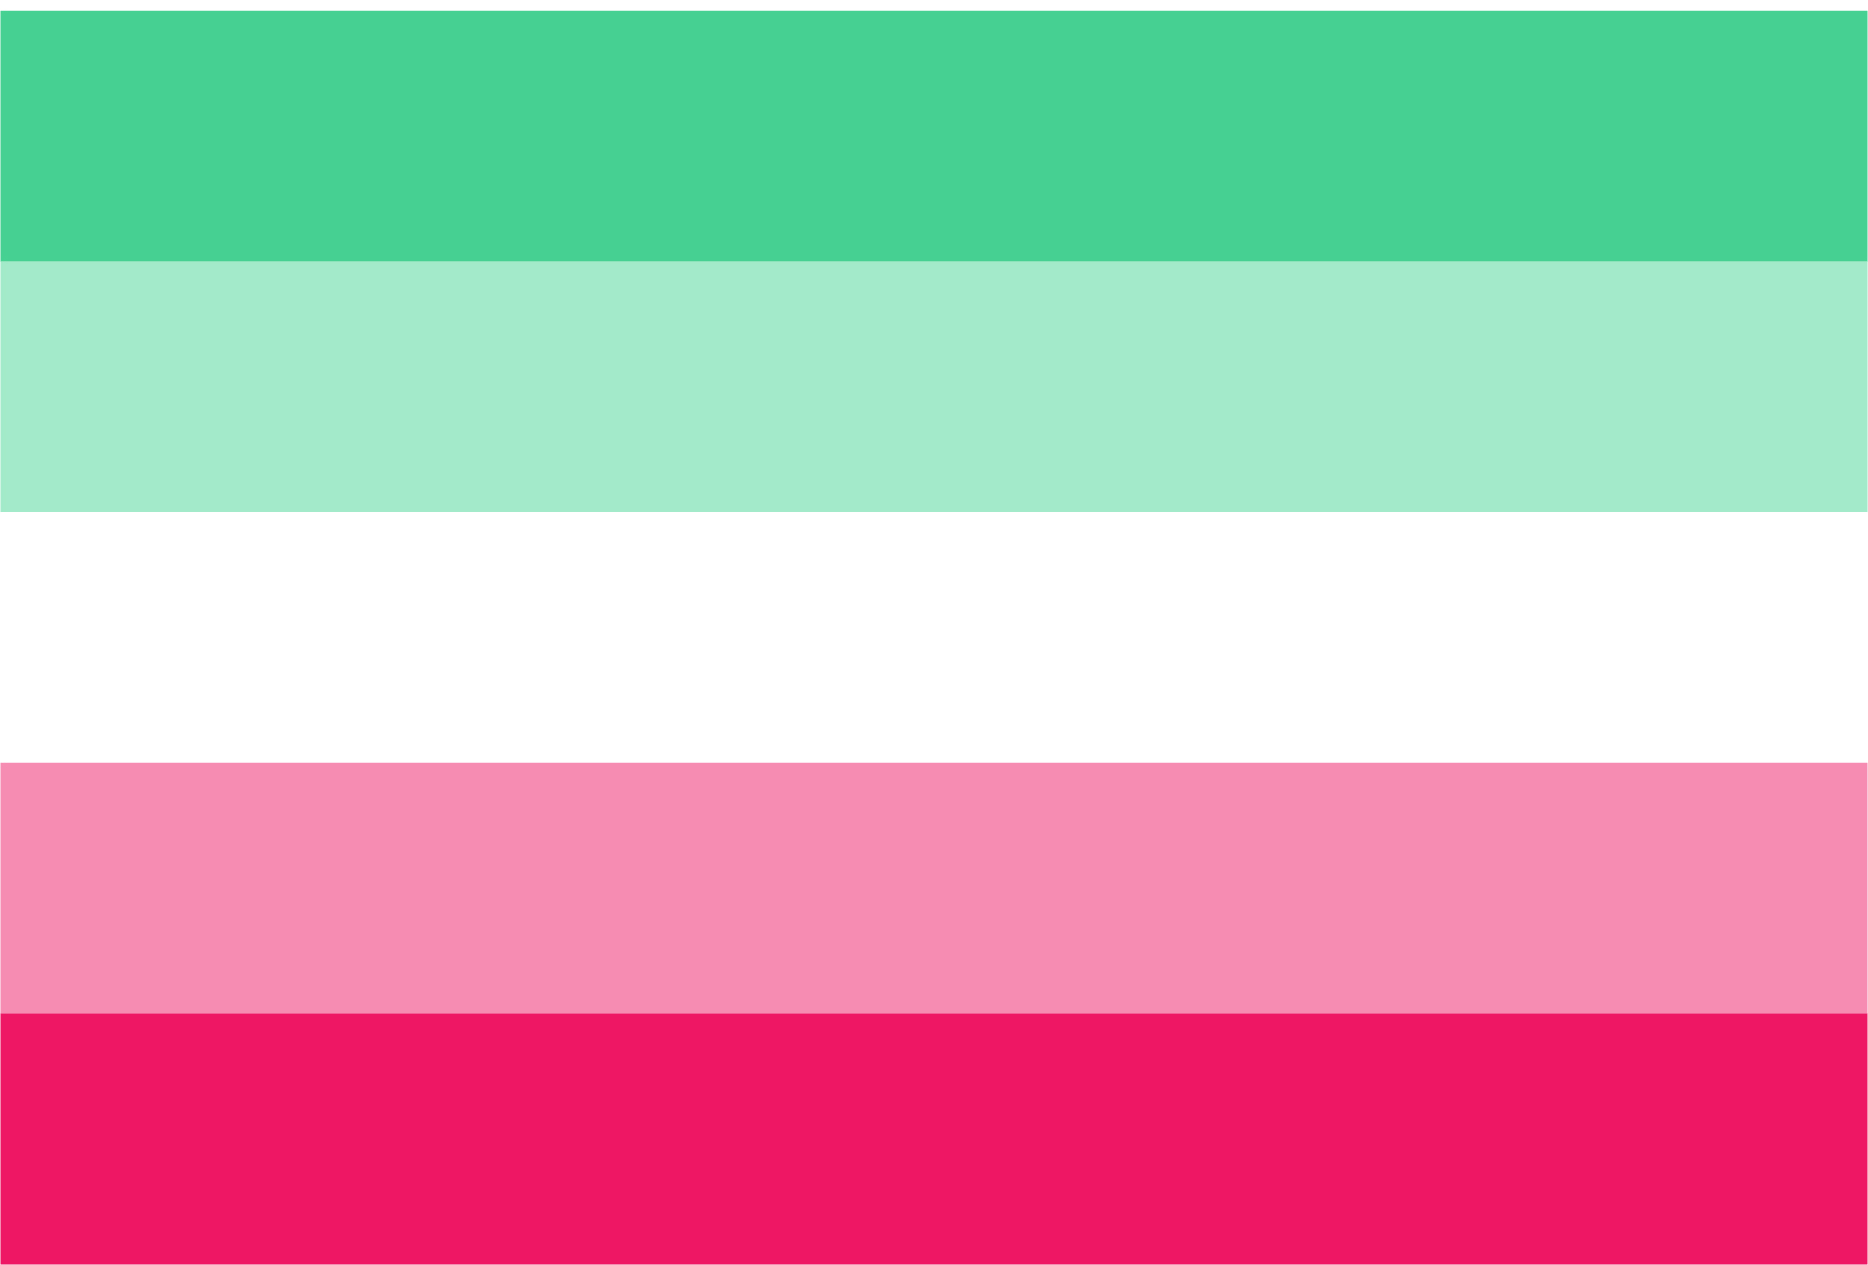 Heterosexual bandera